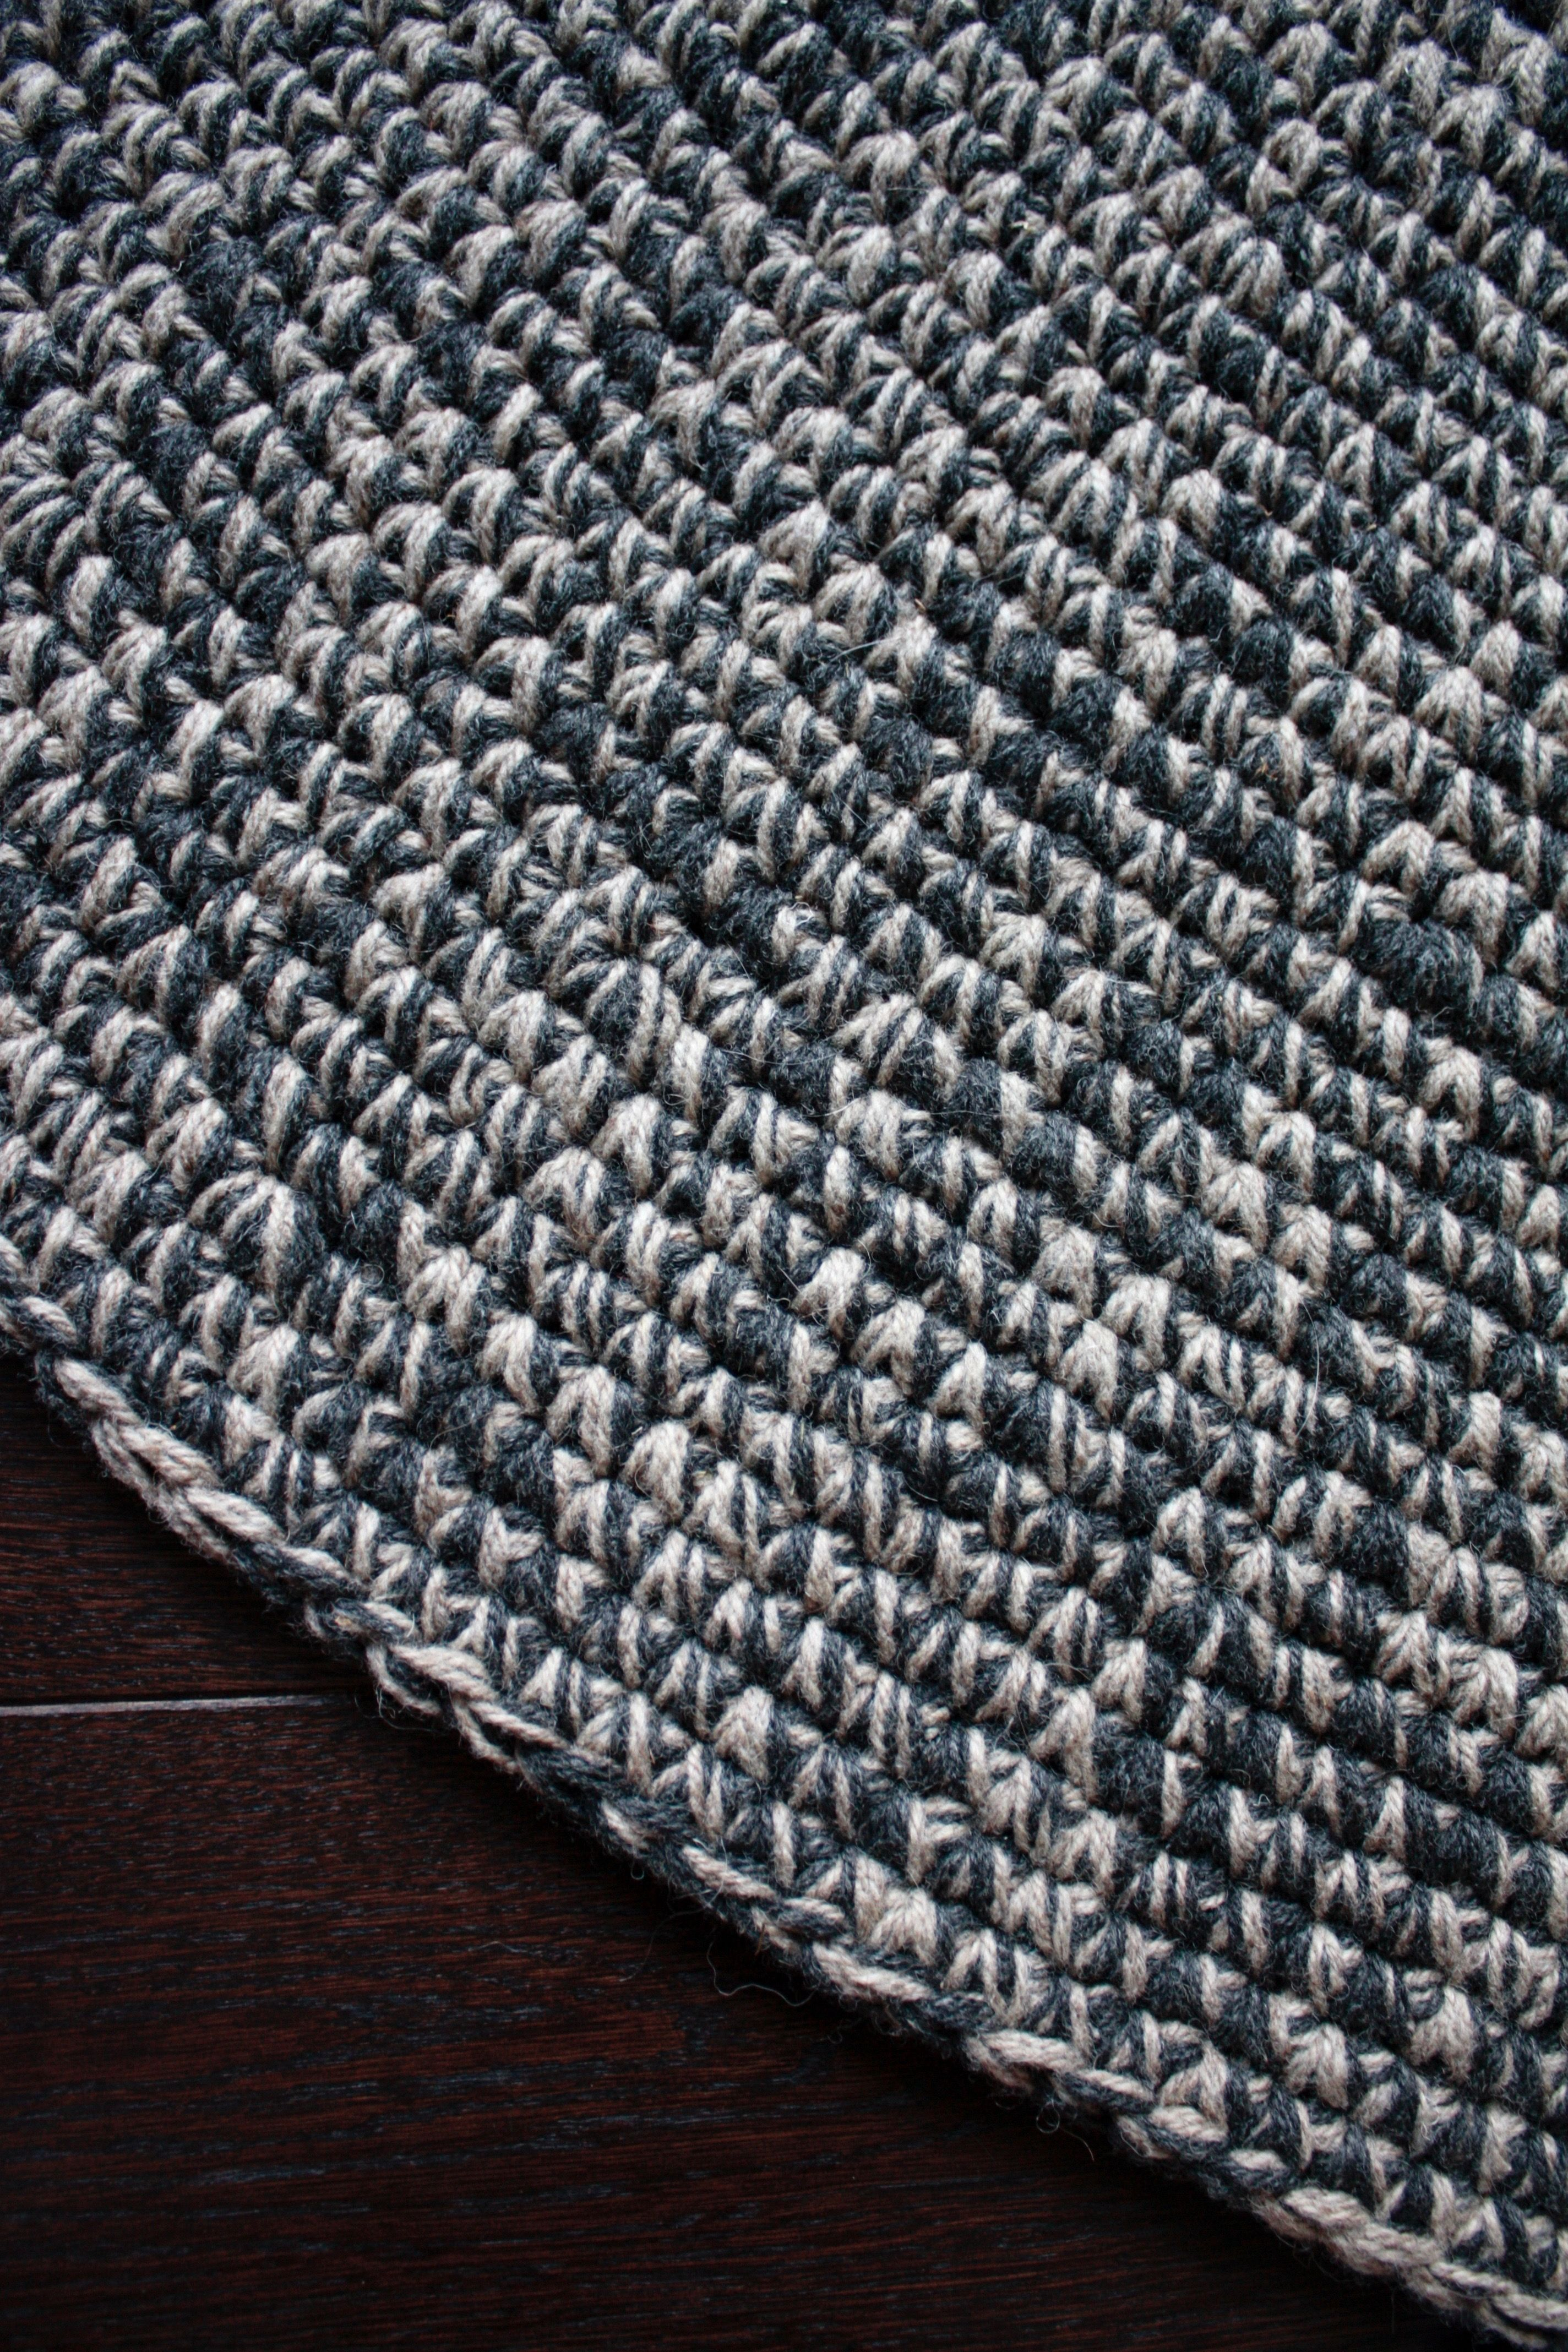 Wool Rug Large Living Room Nursery Hand Made Area Floor Bedroom Carpet Super Bulky Arm Knit